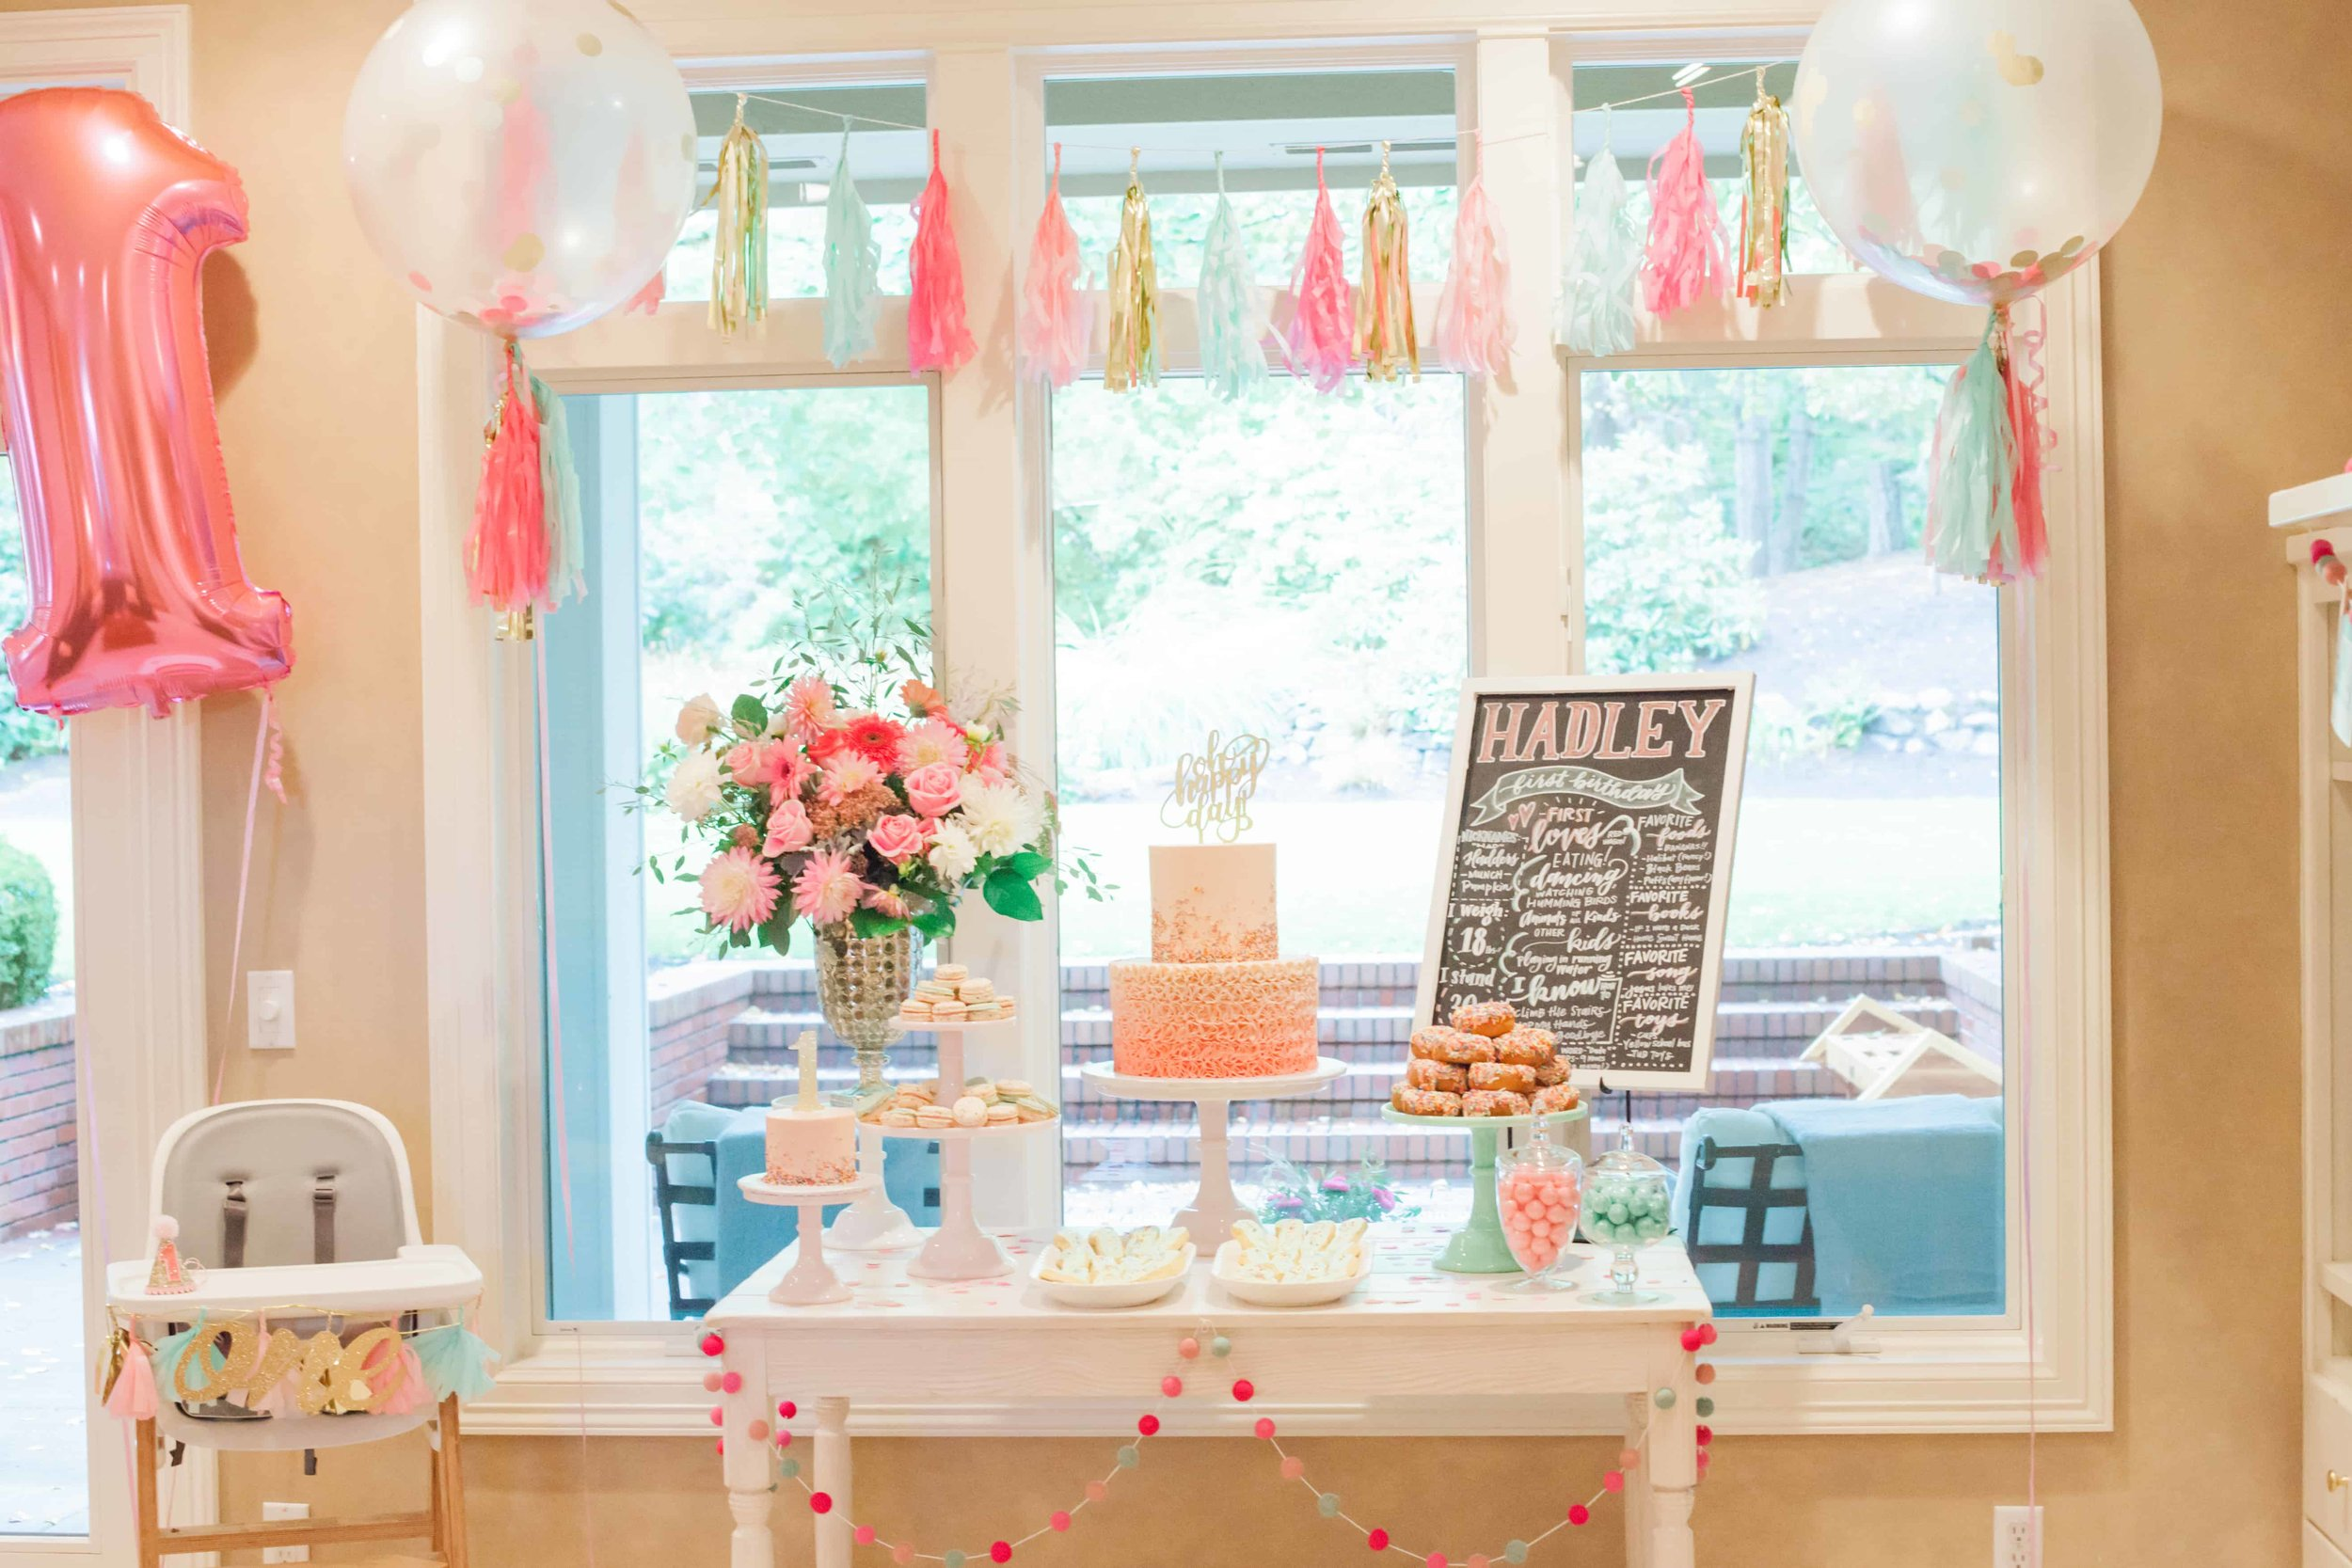 Hadley-First-Birthday-Smash-Cake.jpg